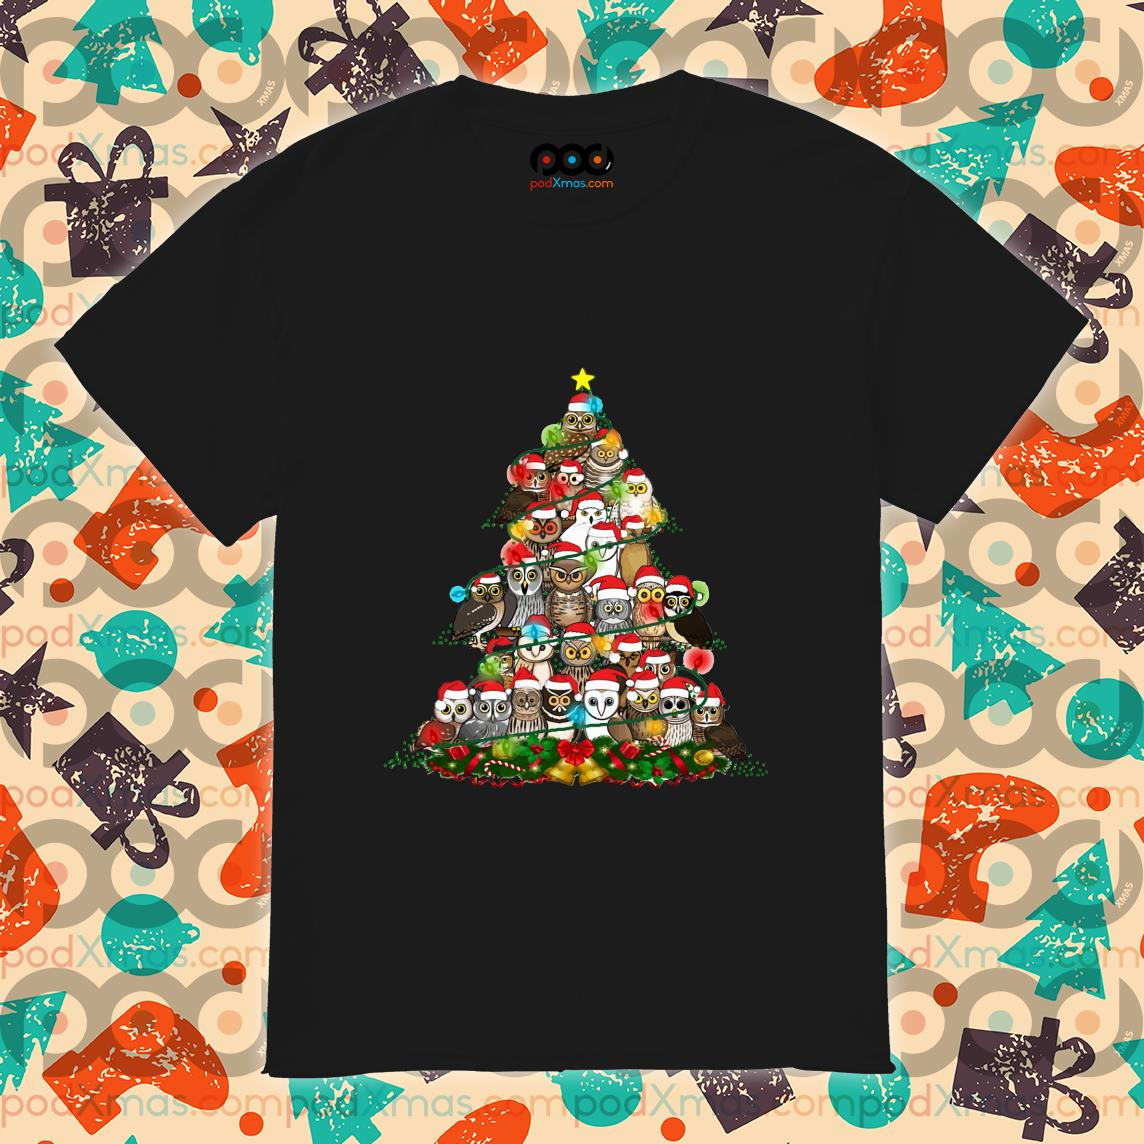 Owls Christmas tree shirt